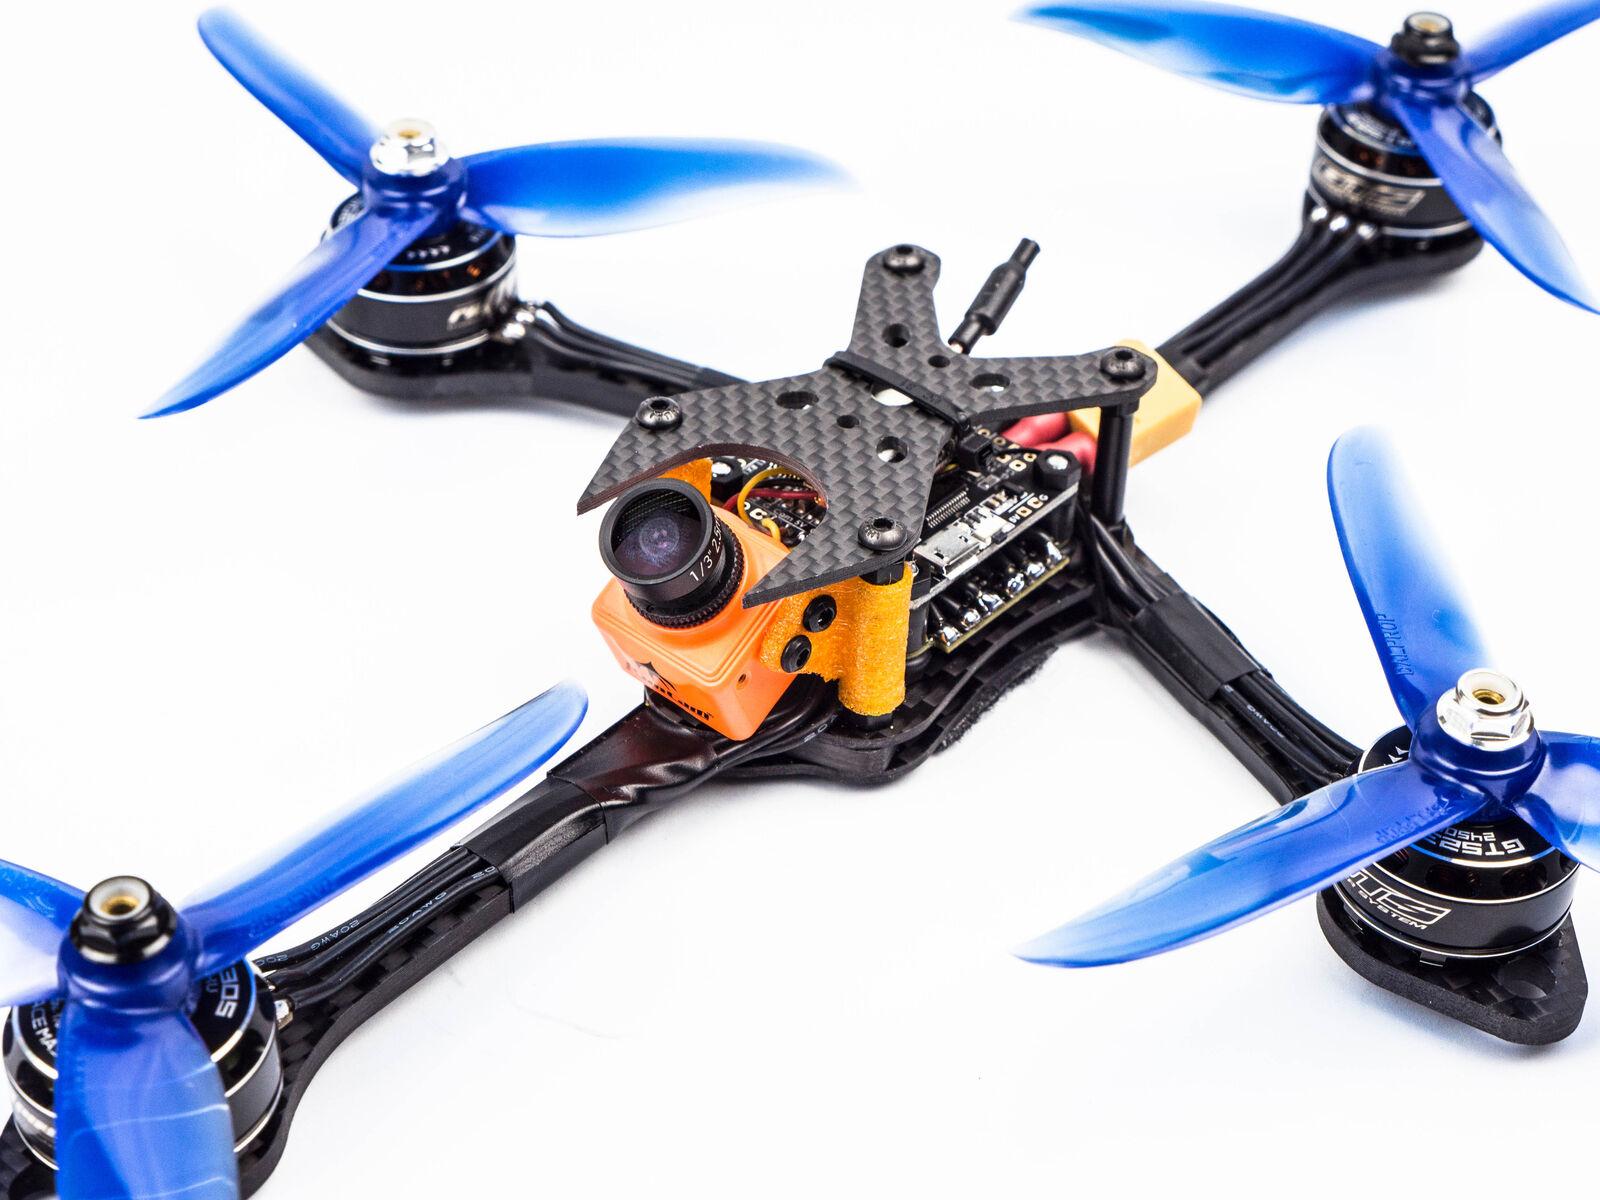 3DPOWER 248-JENT-SP Stretch P Plus+ FPV Racing Quadcopter Frame